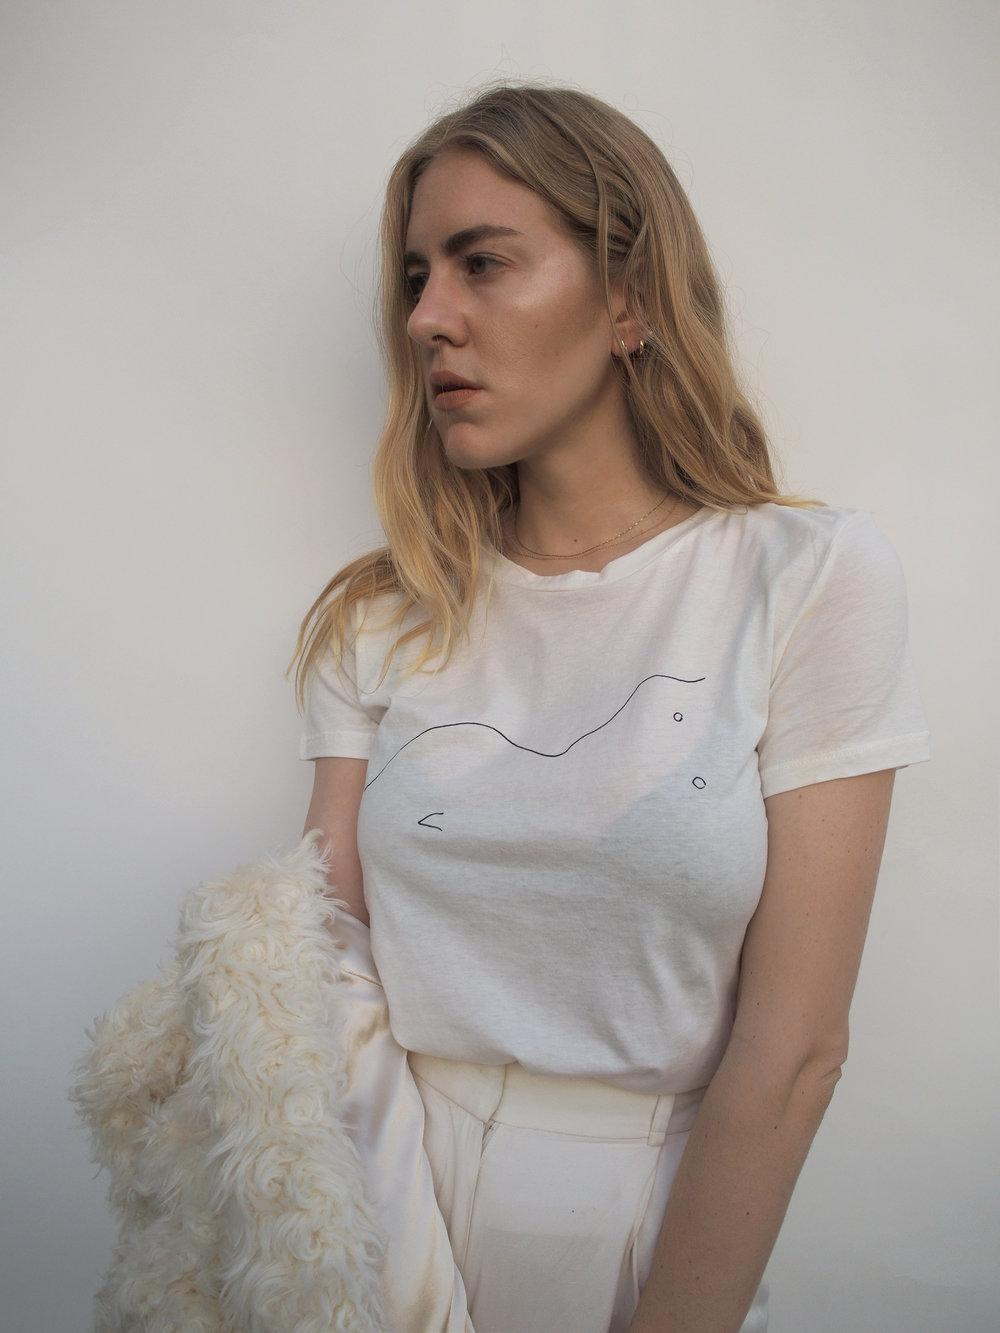 TaylrAnne-KnobblyStudioxLaurieFrank-BeingAWoman